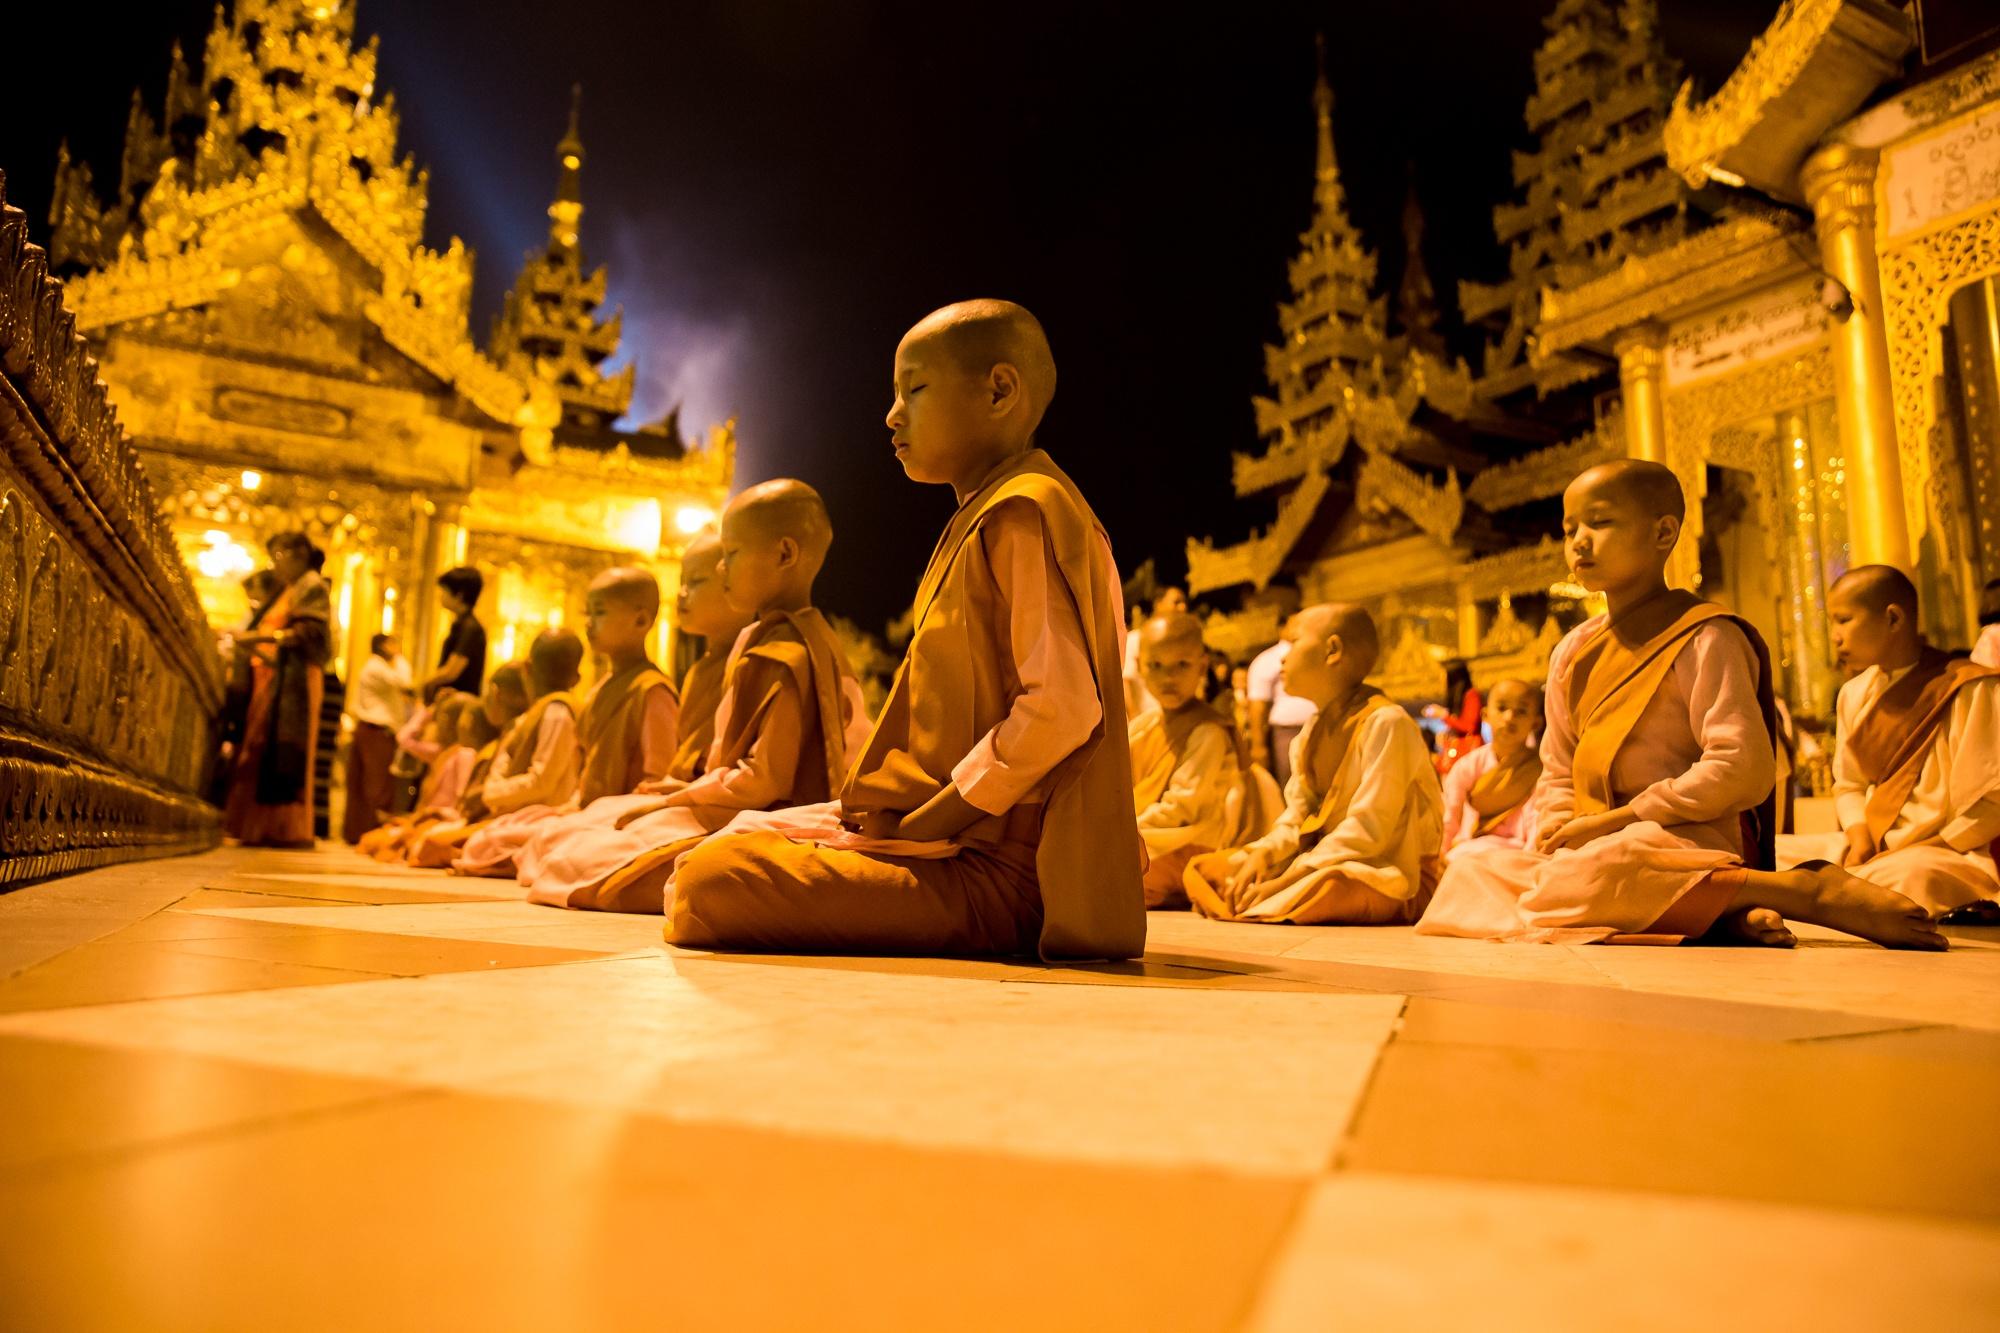 MYANMAR - ARGAZKI MAHATU, Photography & films.